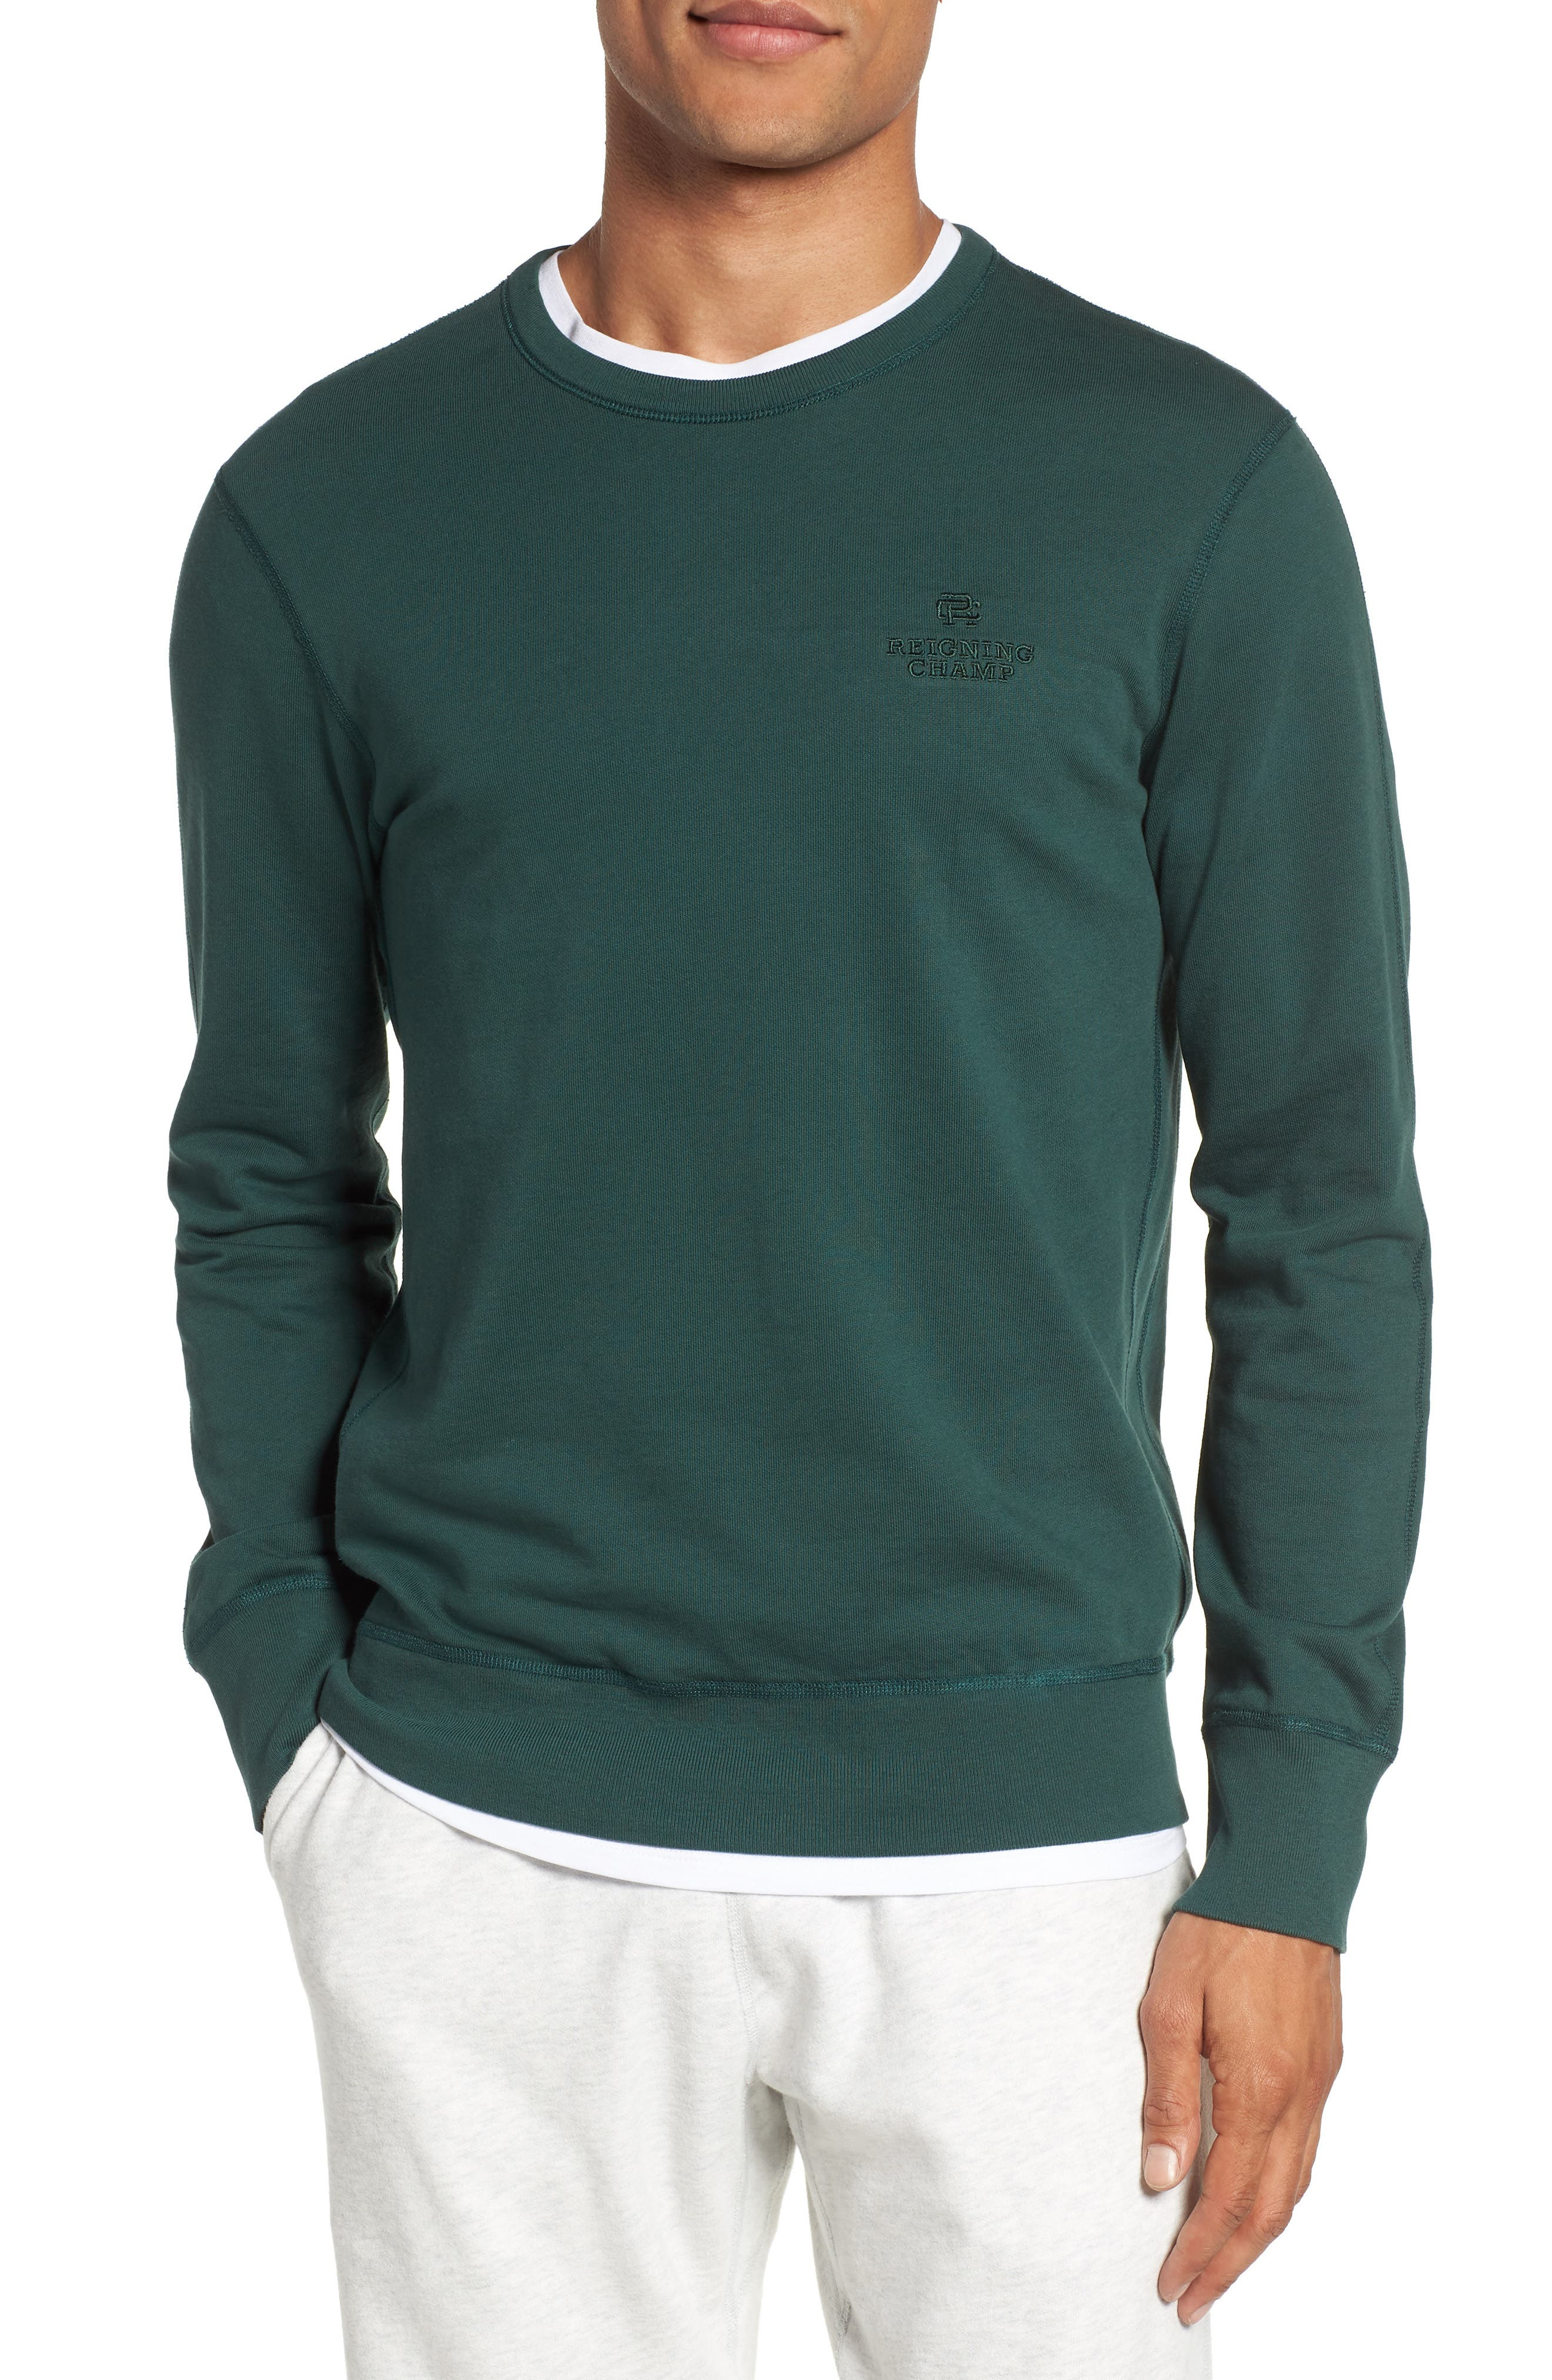 Embroidered Logo Crewneck Sweatshirt,                             Main thumbnail 1, color,                             Court Green